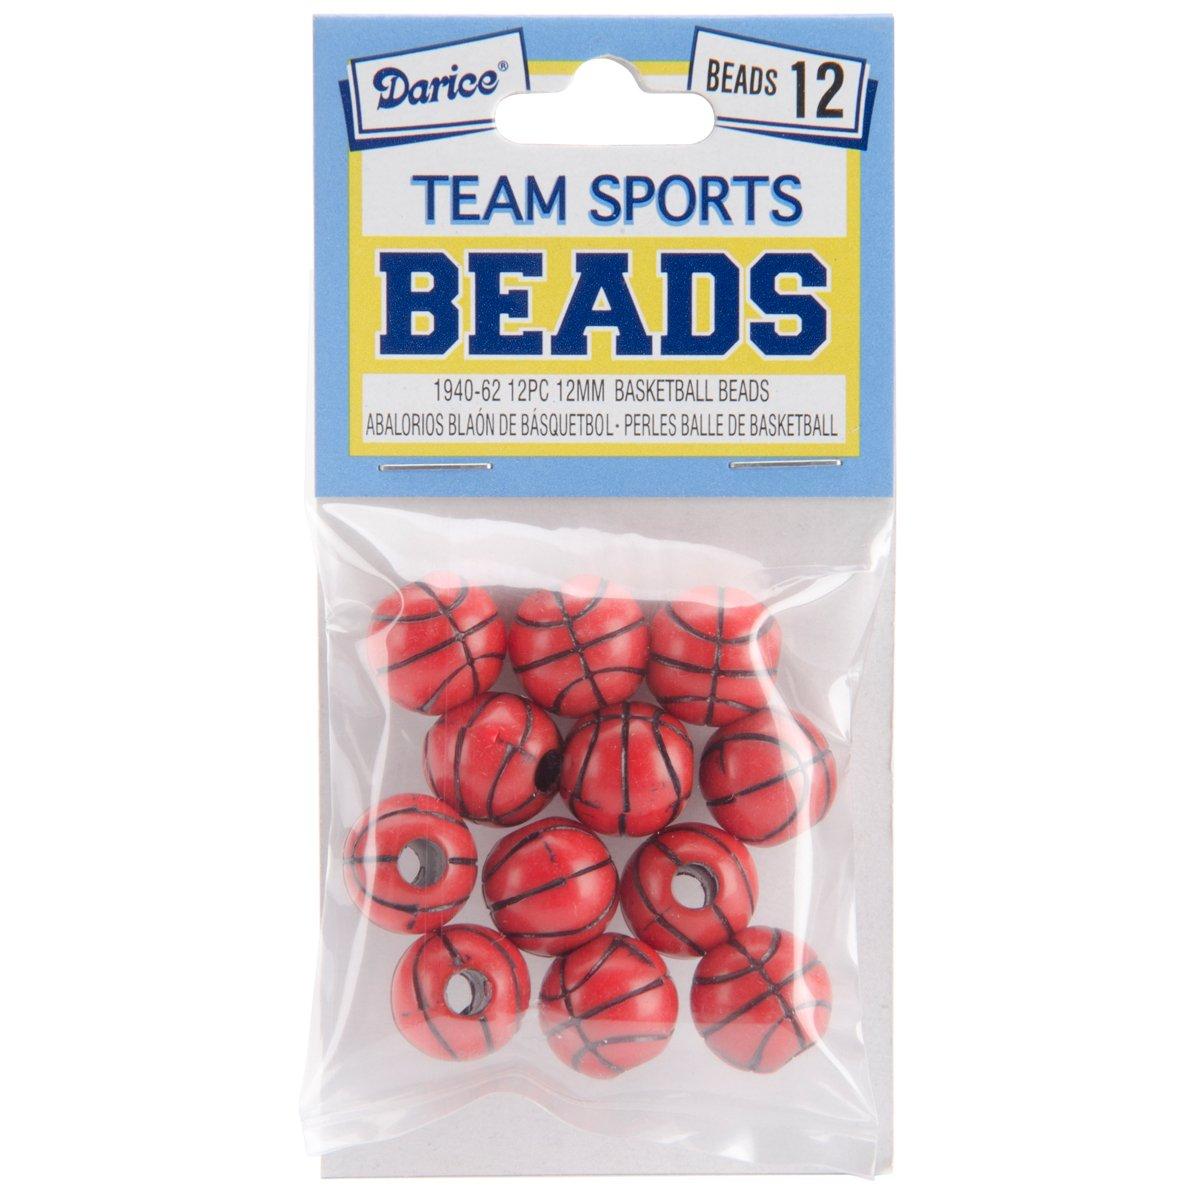 Darice Team sport Beads, 12mm, basket, 12-pack Darice (DARIE) BD1940-62